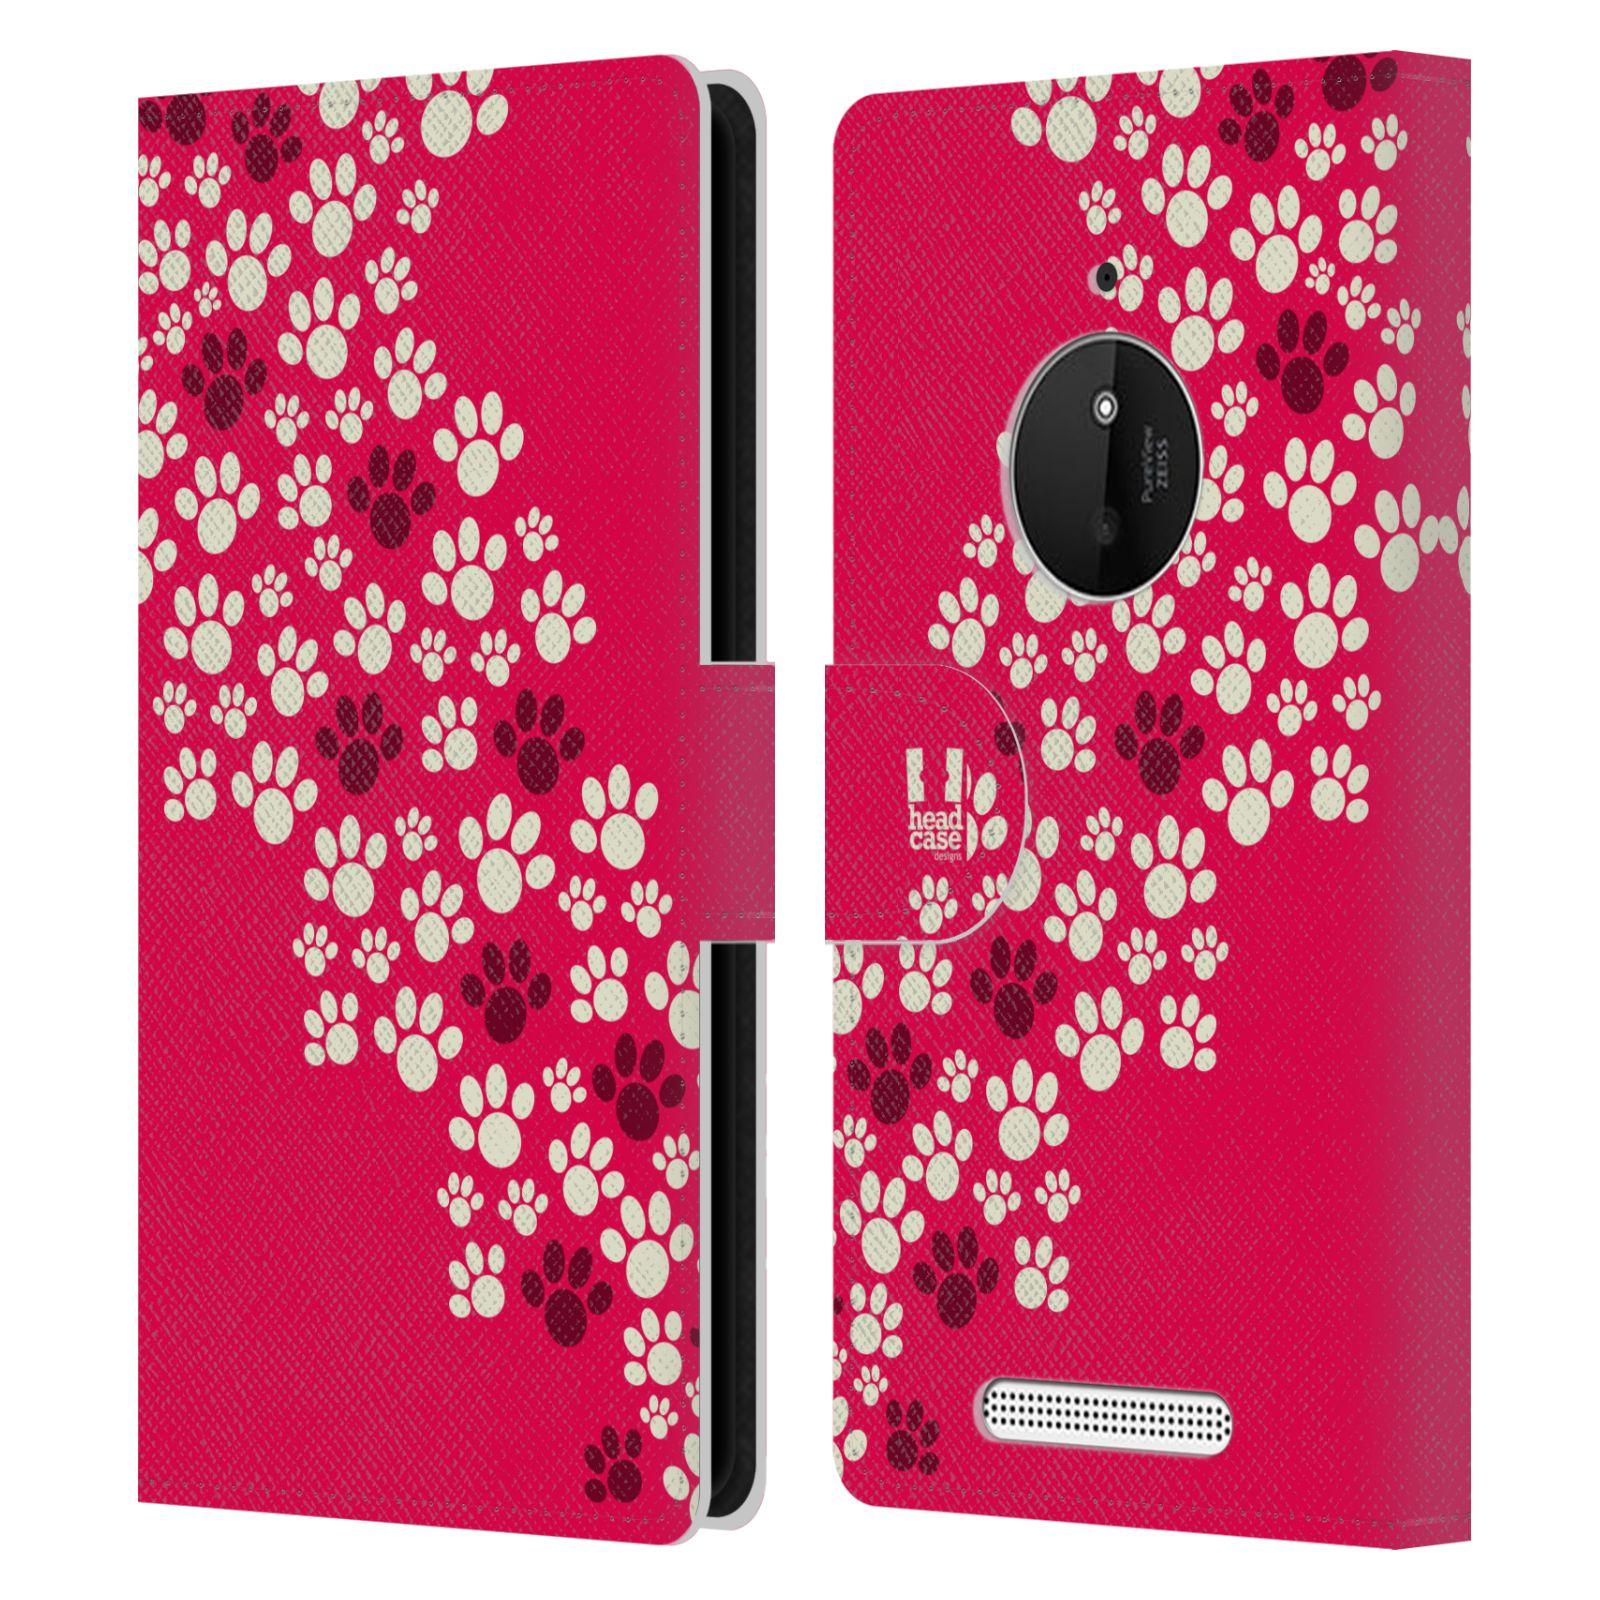 HEAD CASE Flipové pouzdro pro mobil NOKIA LUMIA 830 Pejsek ťapky růžová barva